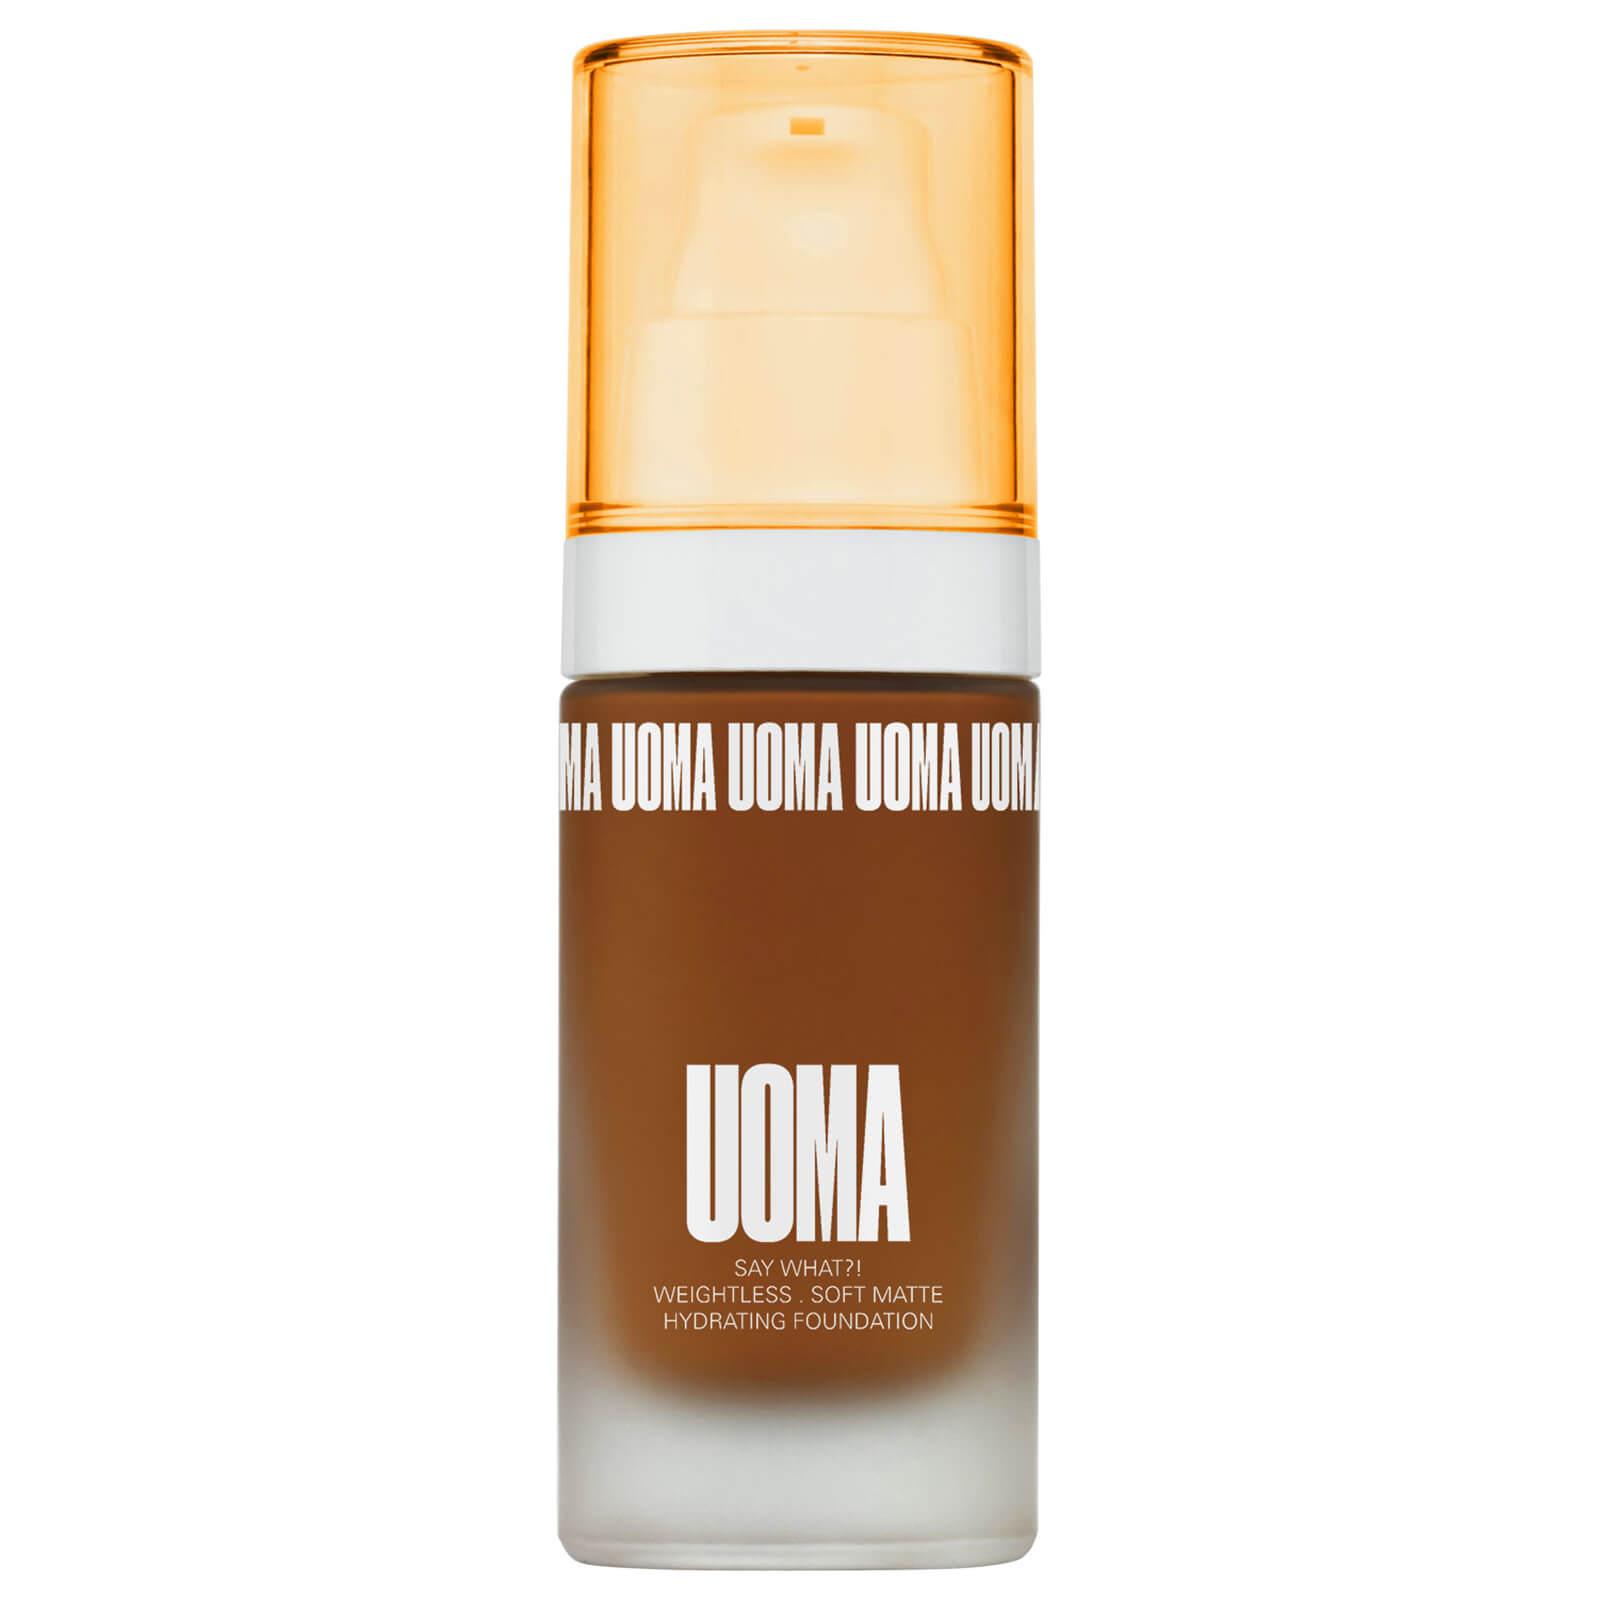 UOMA Beauty Say What Foundation 30ml (Various Shades) - Brown Sugar T3C